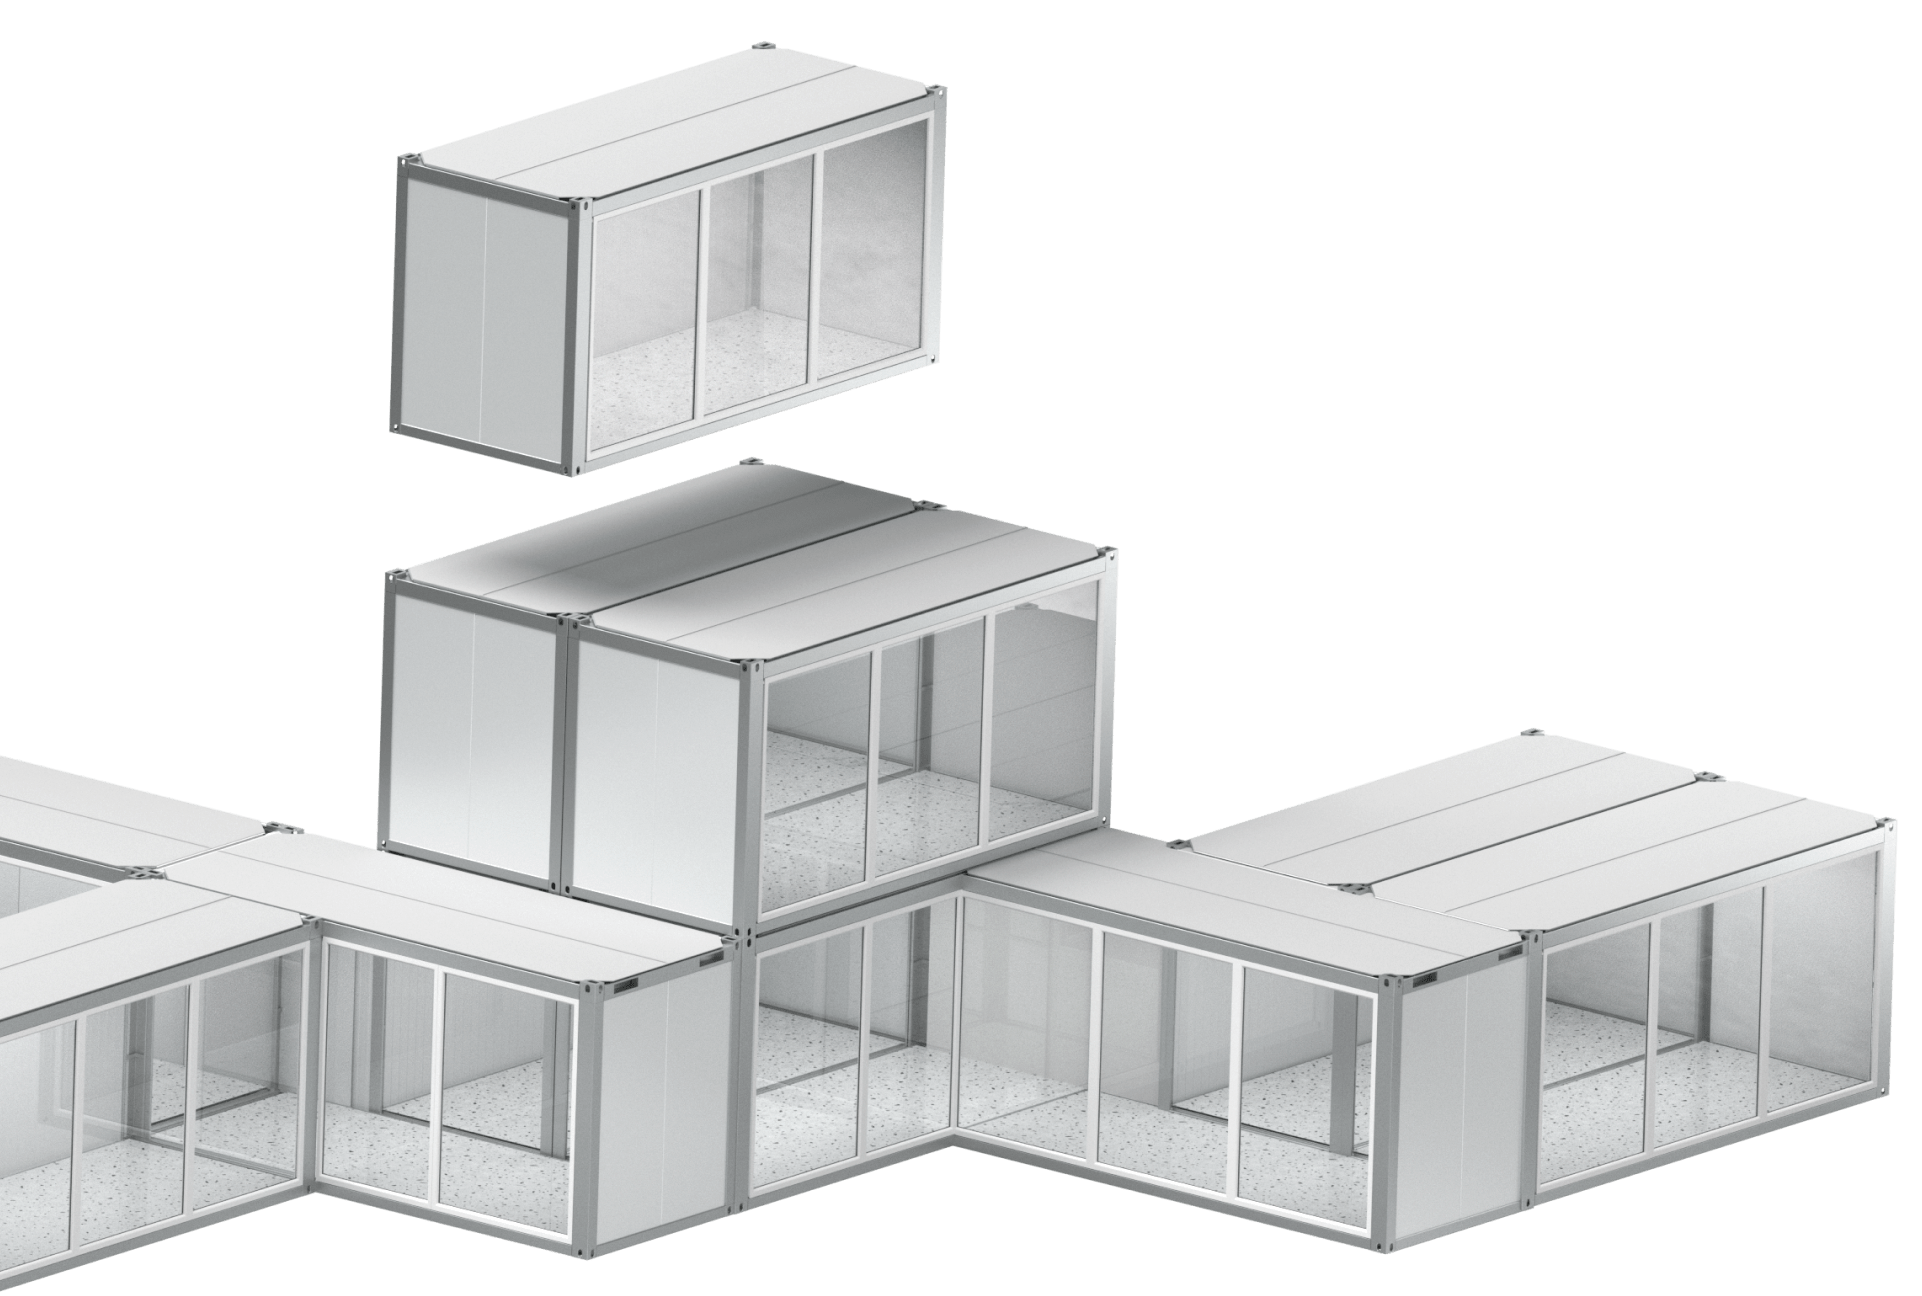 Prefab modular office building